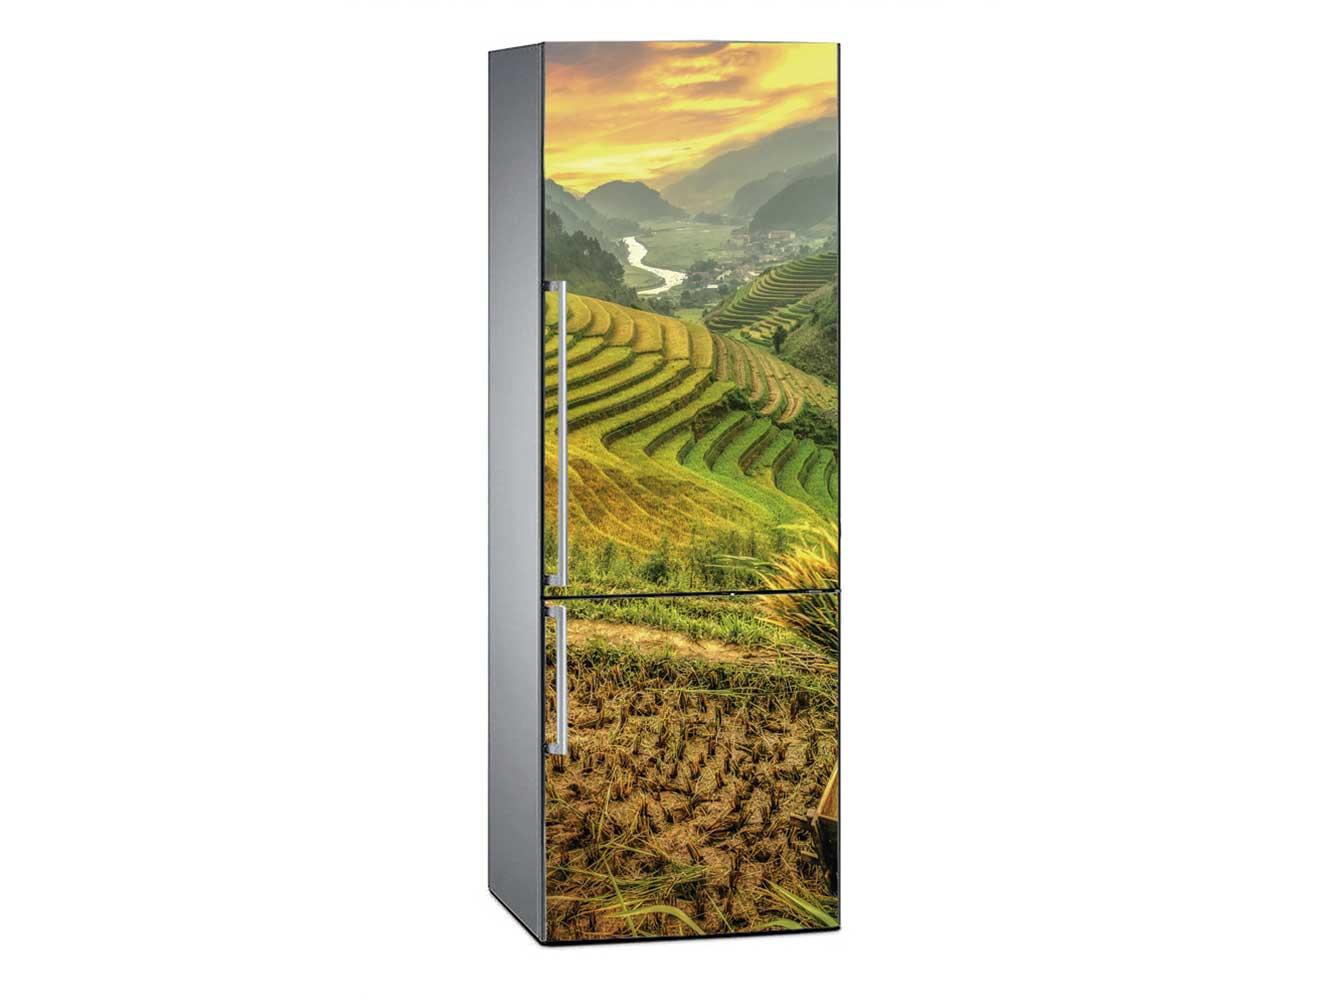 Vinilo Frigorífico Campos de Arroz Vietnam | Carteles XXL - Impresión carteleria publicitaria